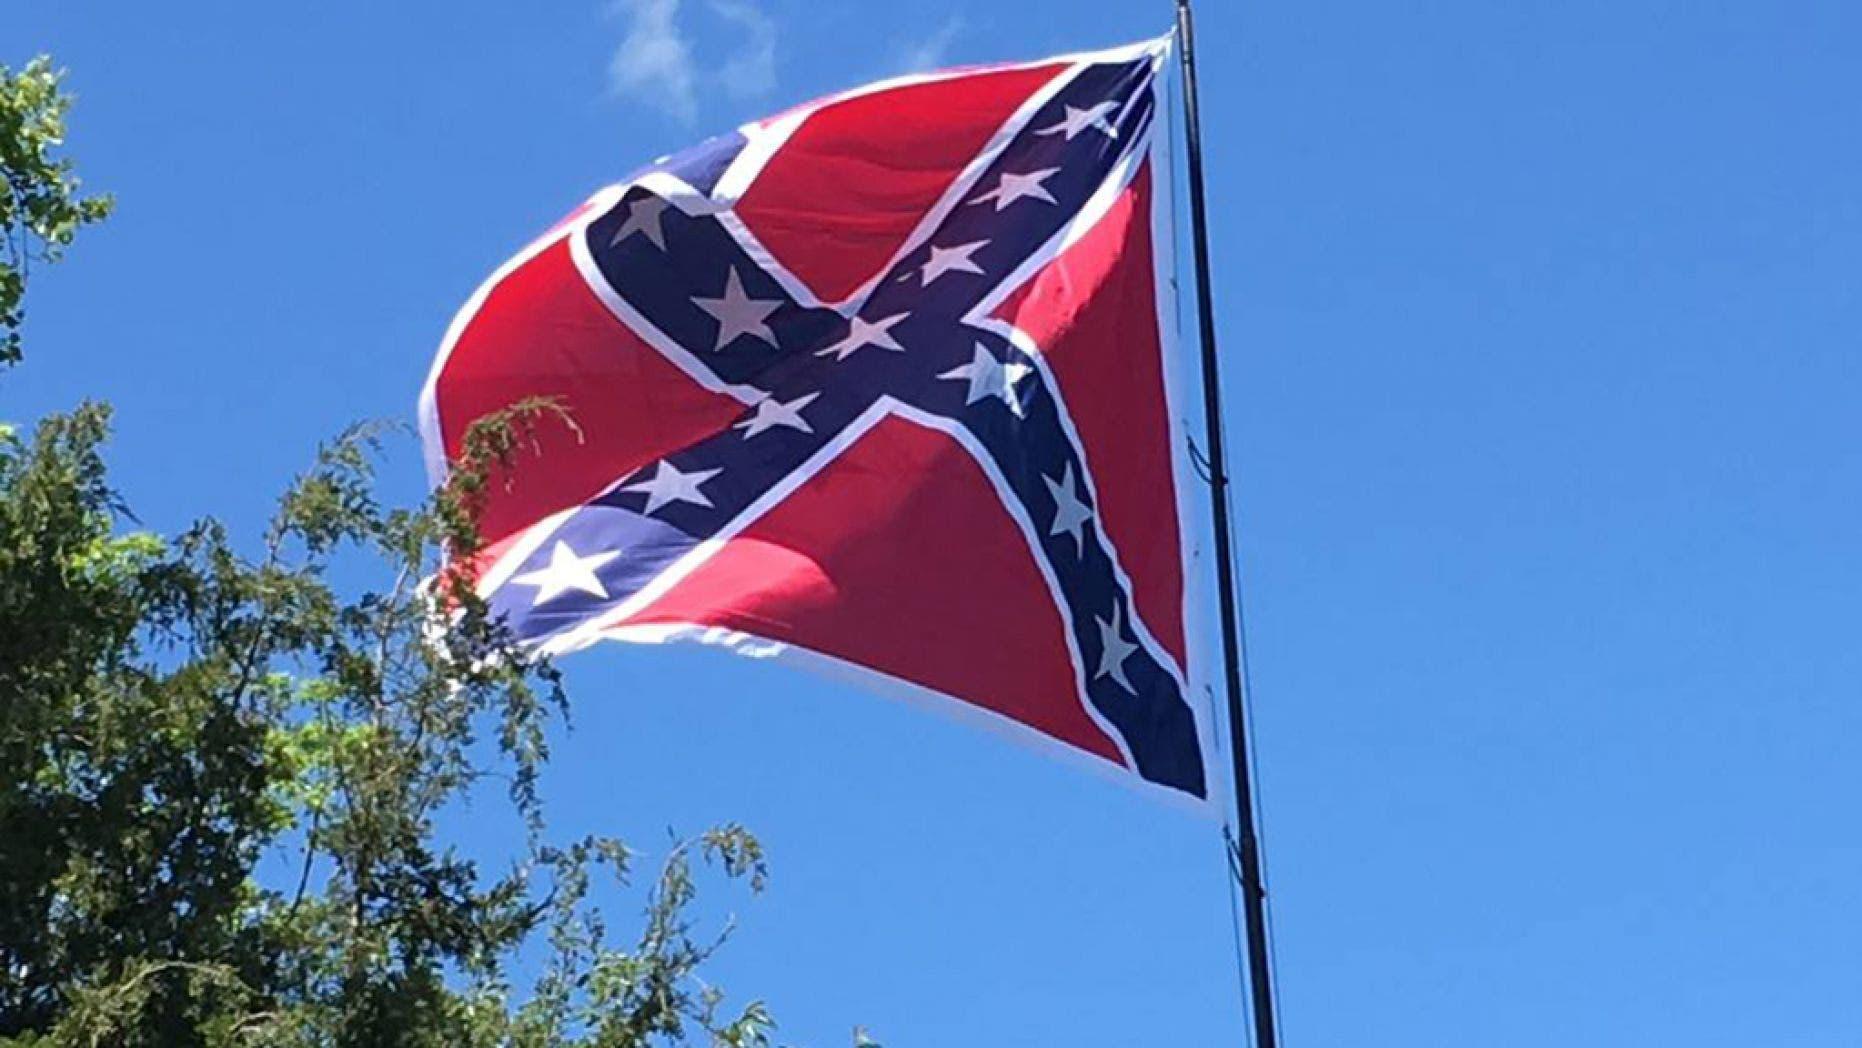 Westlake Legal Group flag_orange20county Sons of Confederate Veterans' appeal over Christmas parade denial heard in Louisiana fox-news/us/us-regions/southeast/louisiana fox-news/special/occasions/christmas fnc/us fnc Associated Press article 06357e8e-fef0-56c5-9132-26ad3811ca82